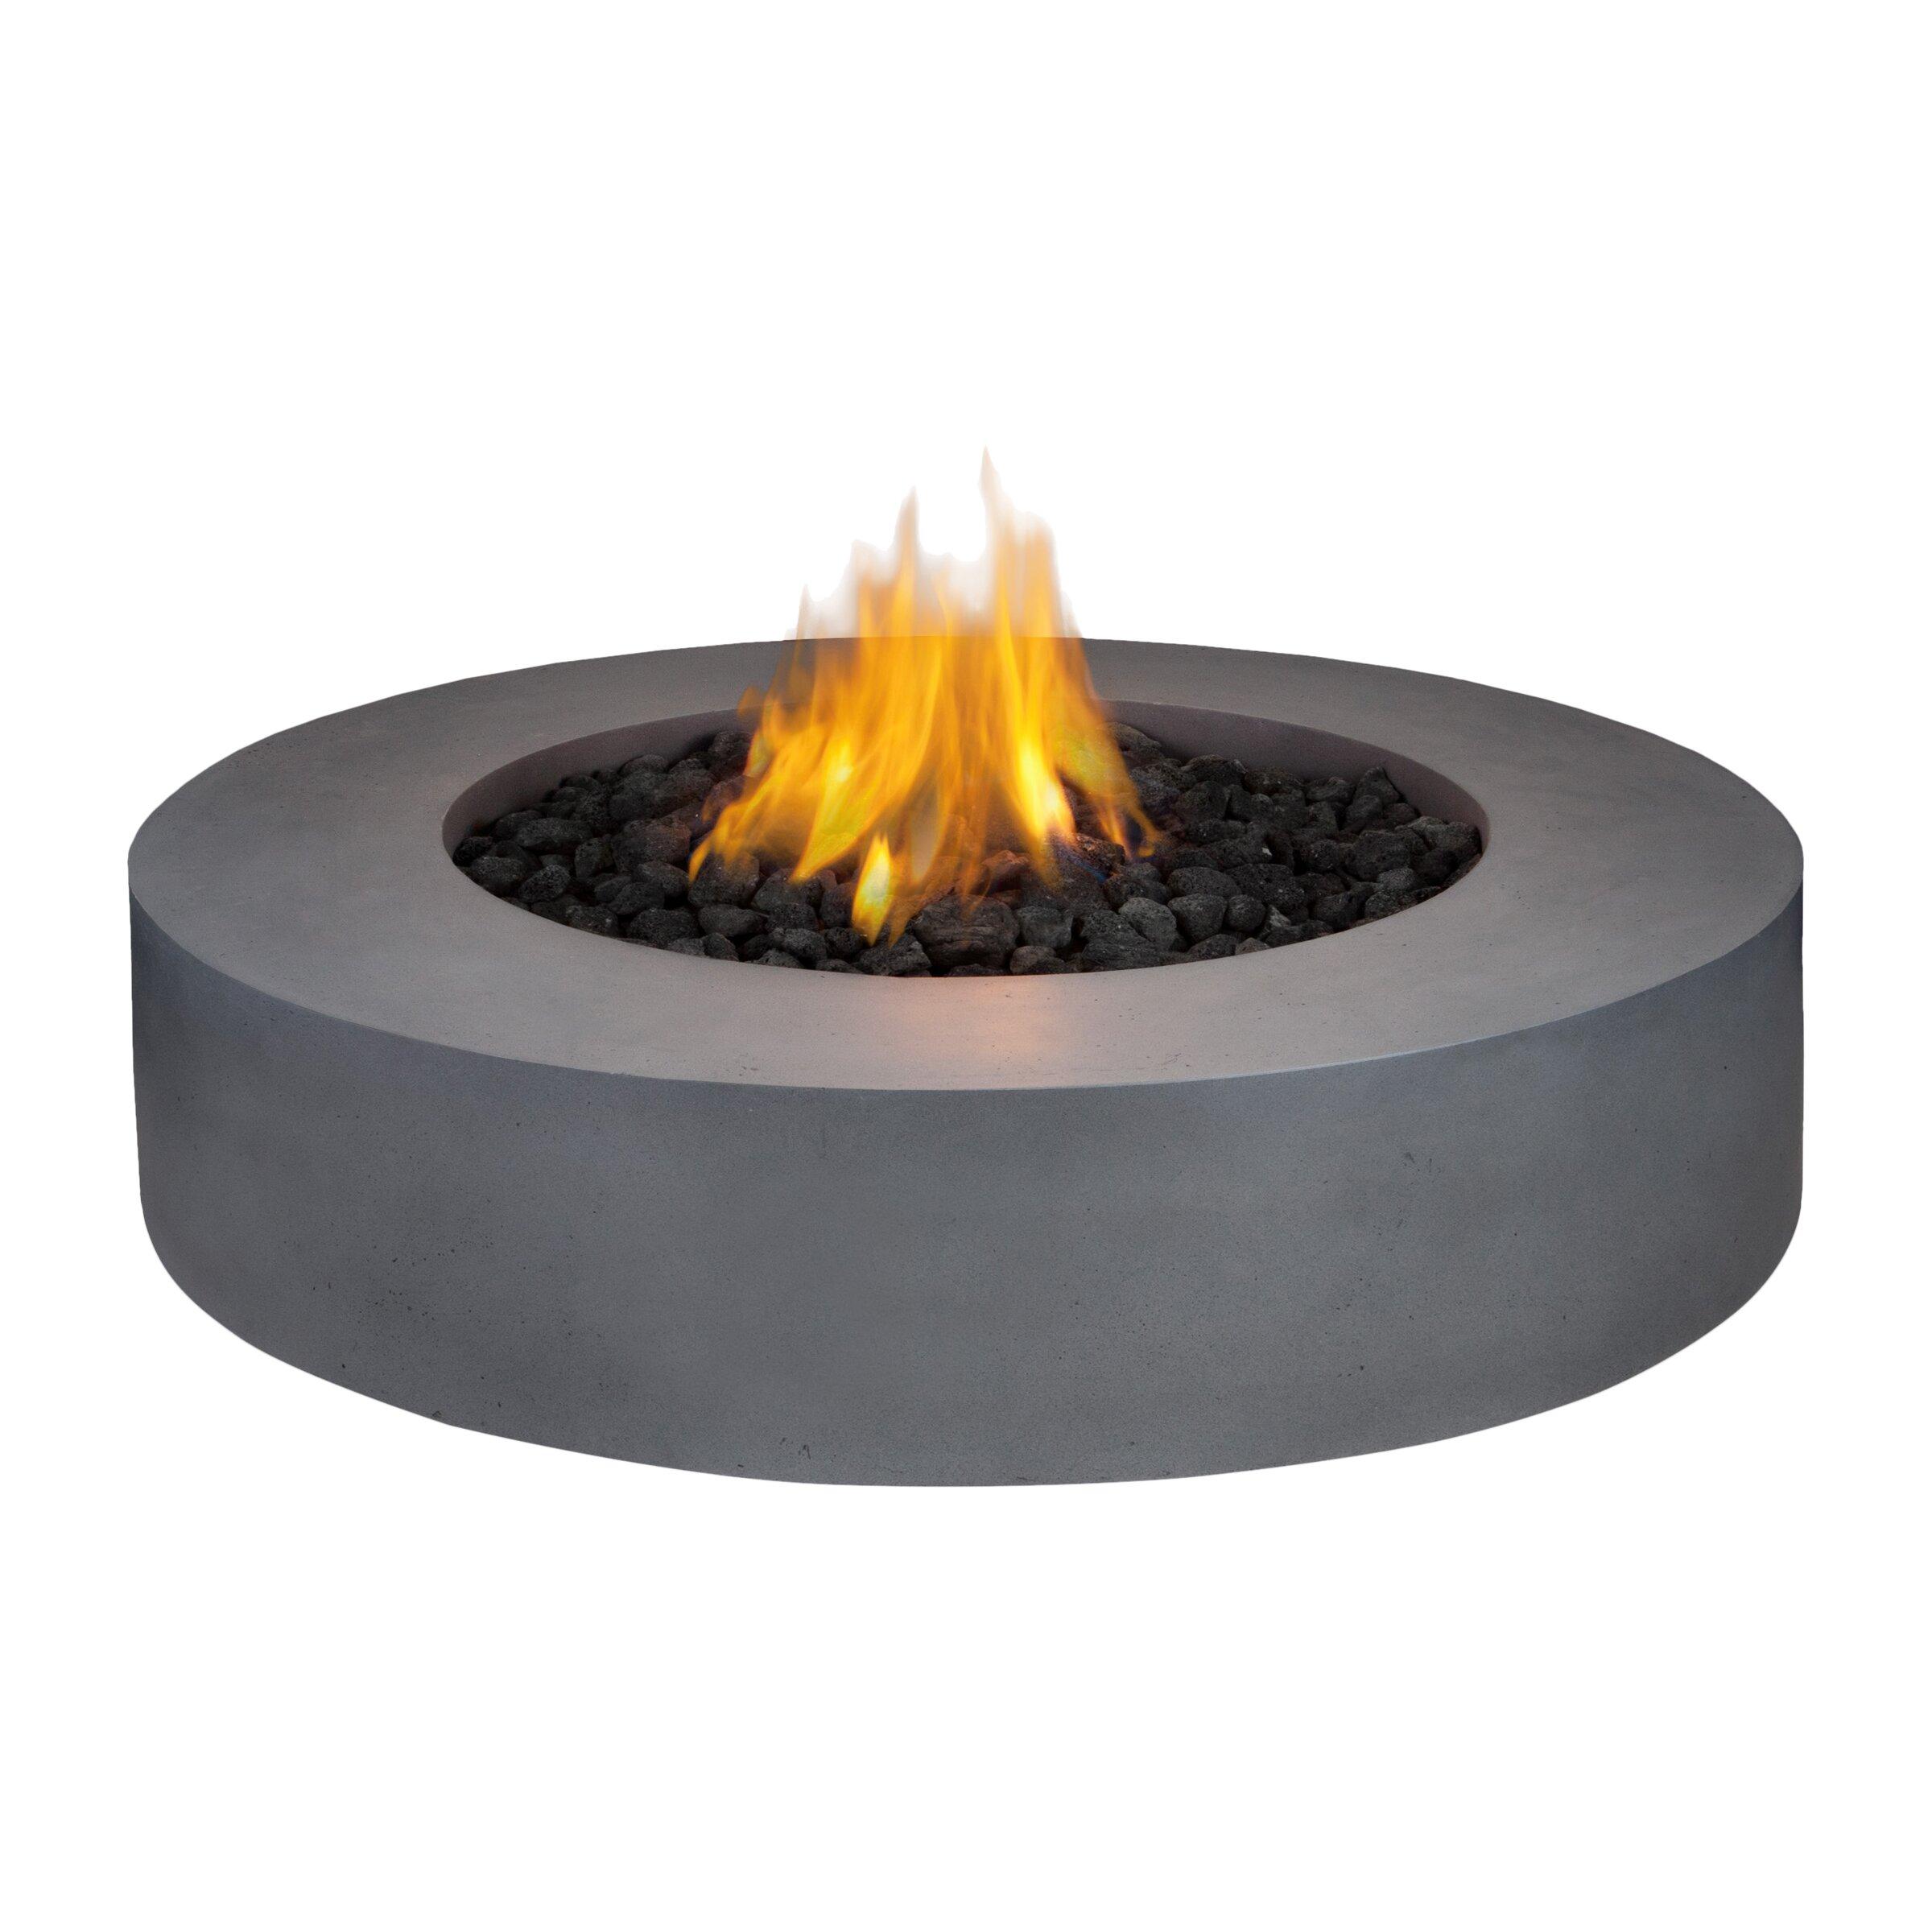 Propane Fire Pit : Real flame mezzo propane fire pit table reviews wayfair